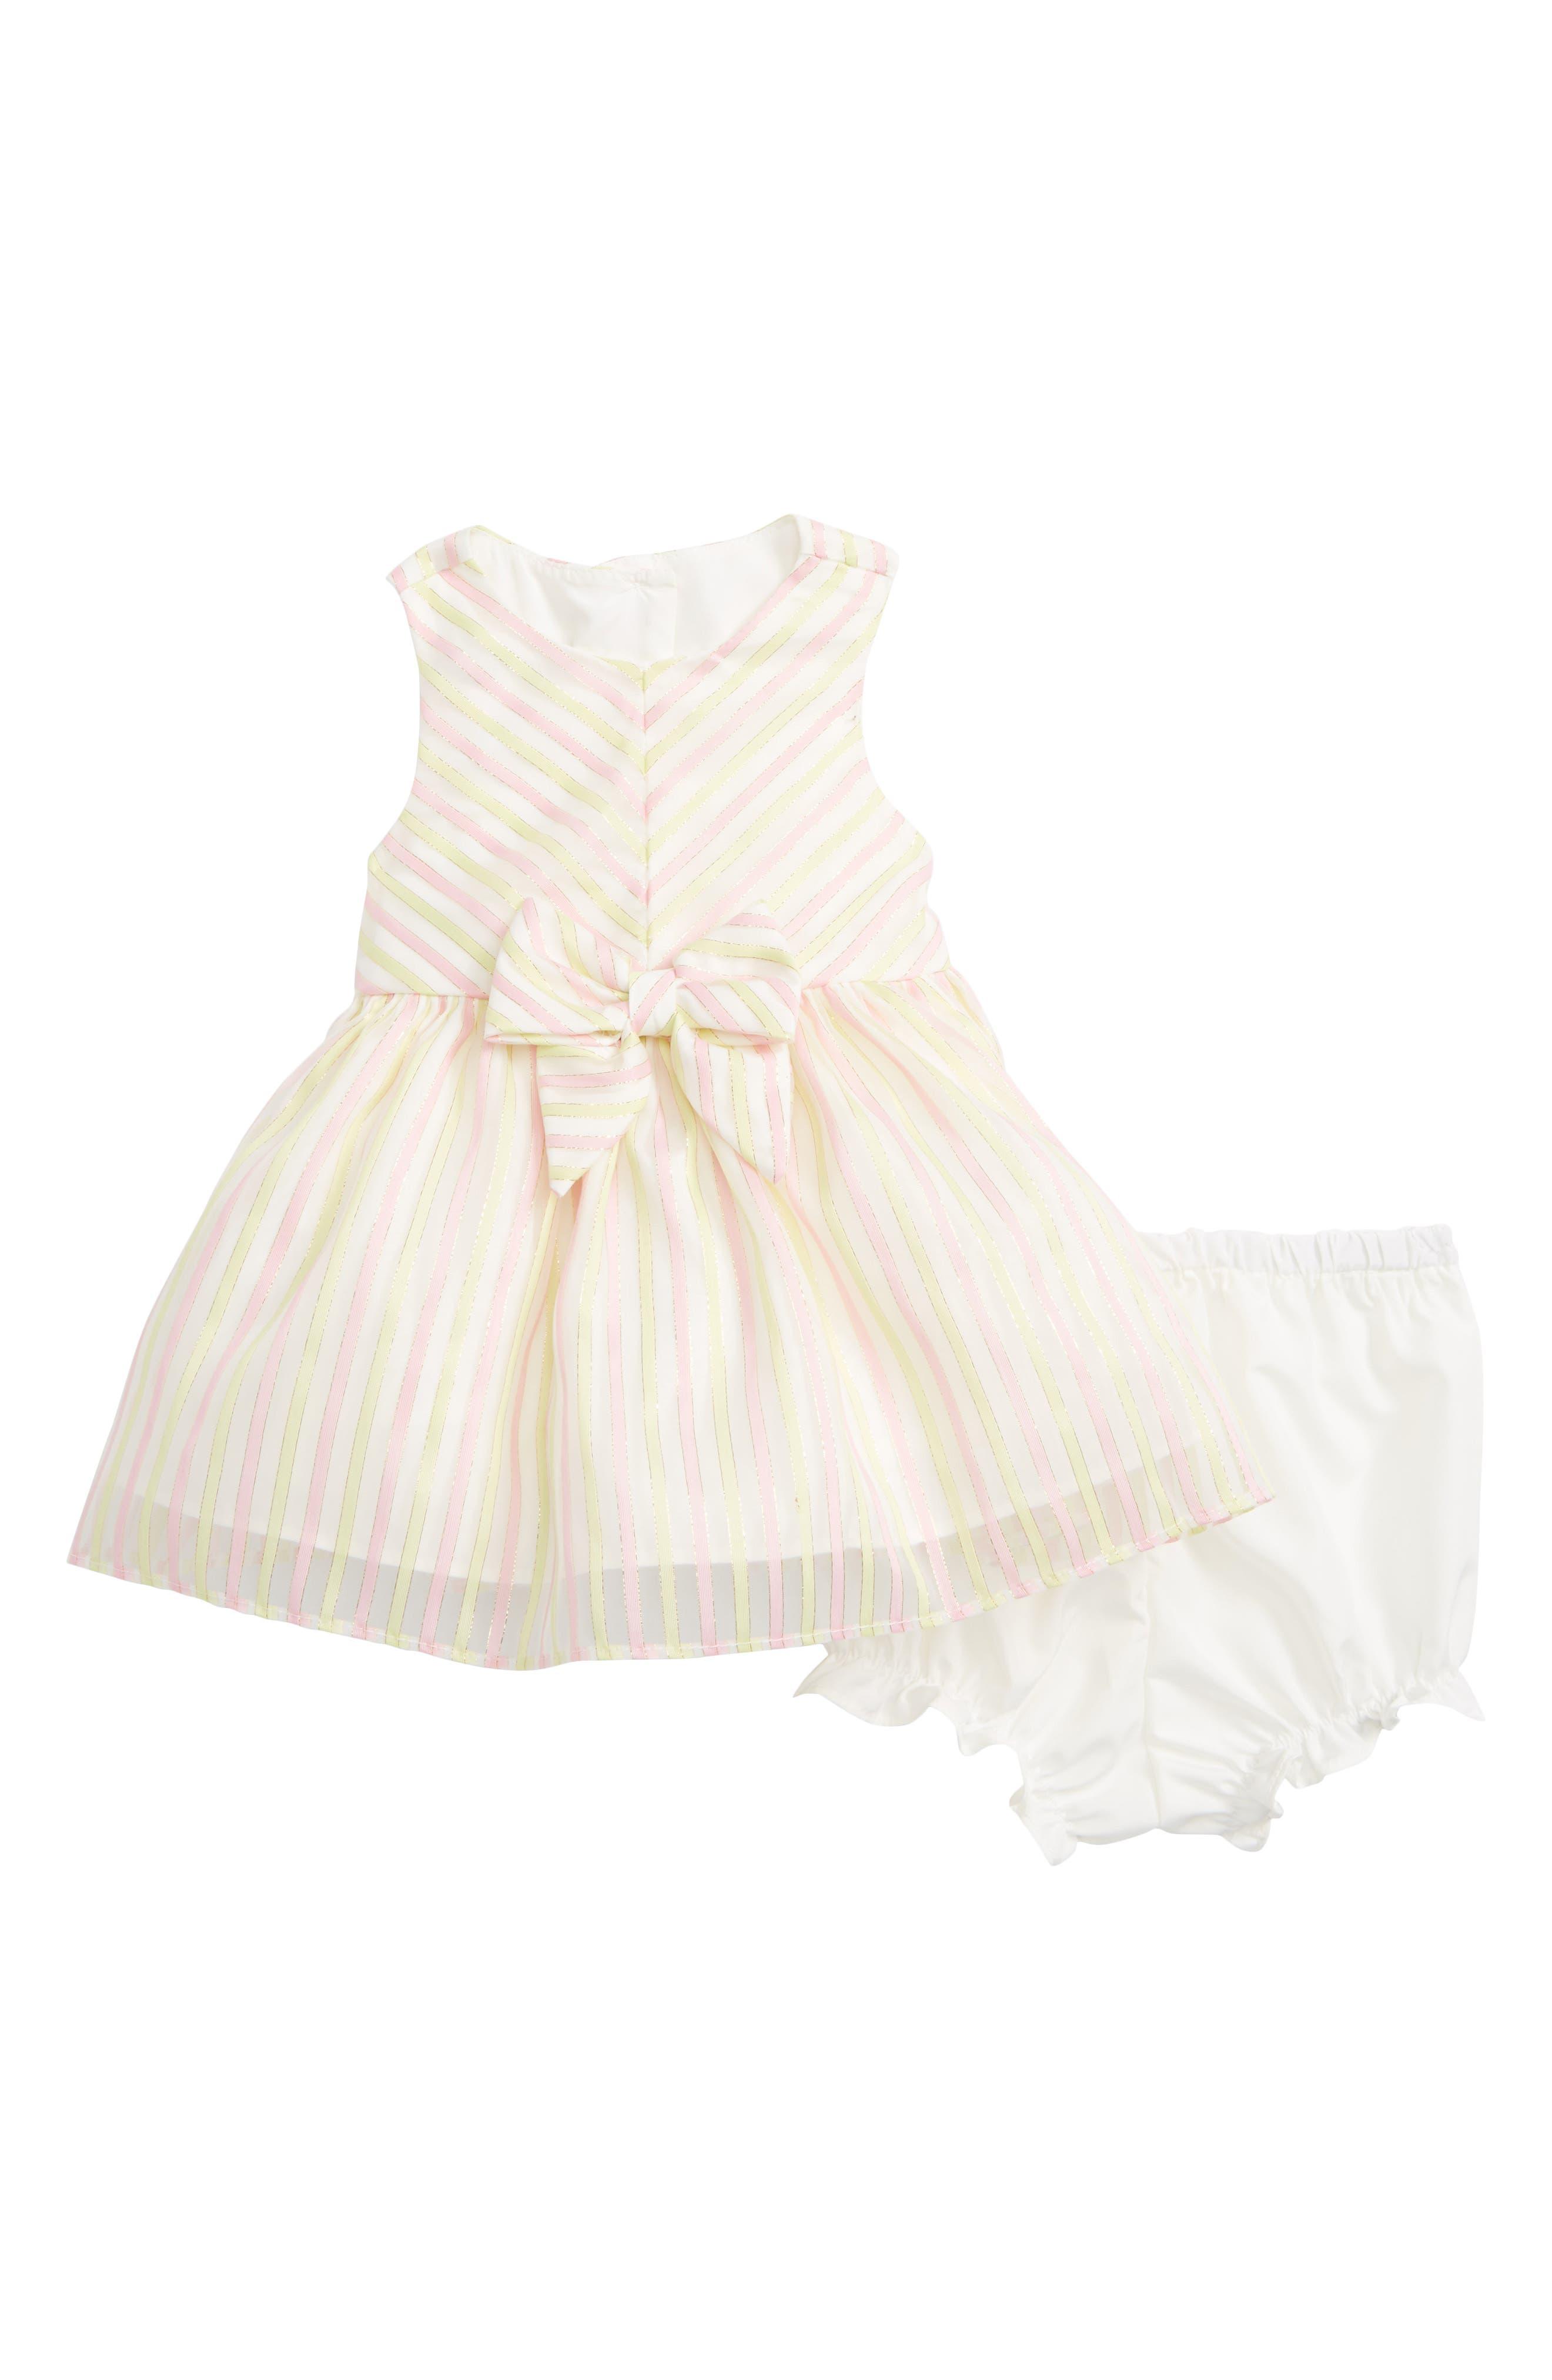 Stripe Dress,                         Main,                         color, Pink/ Yellow